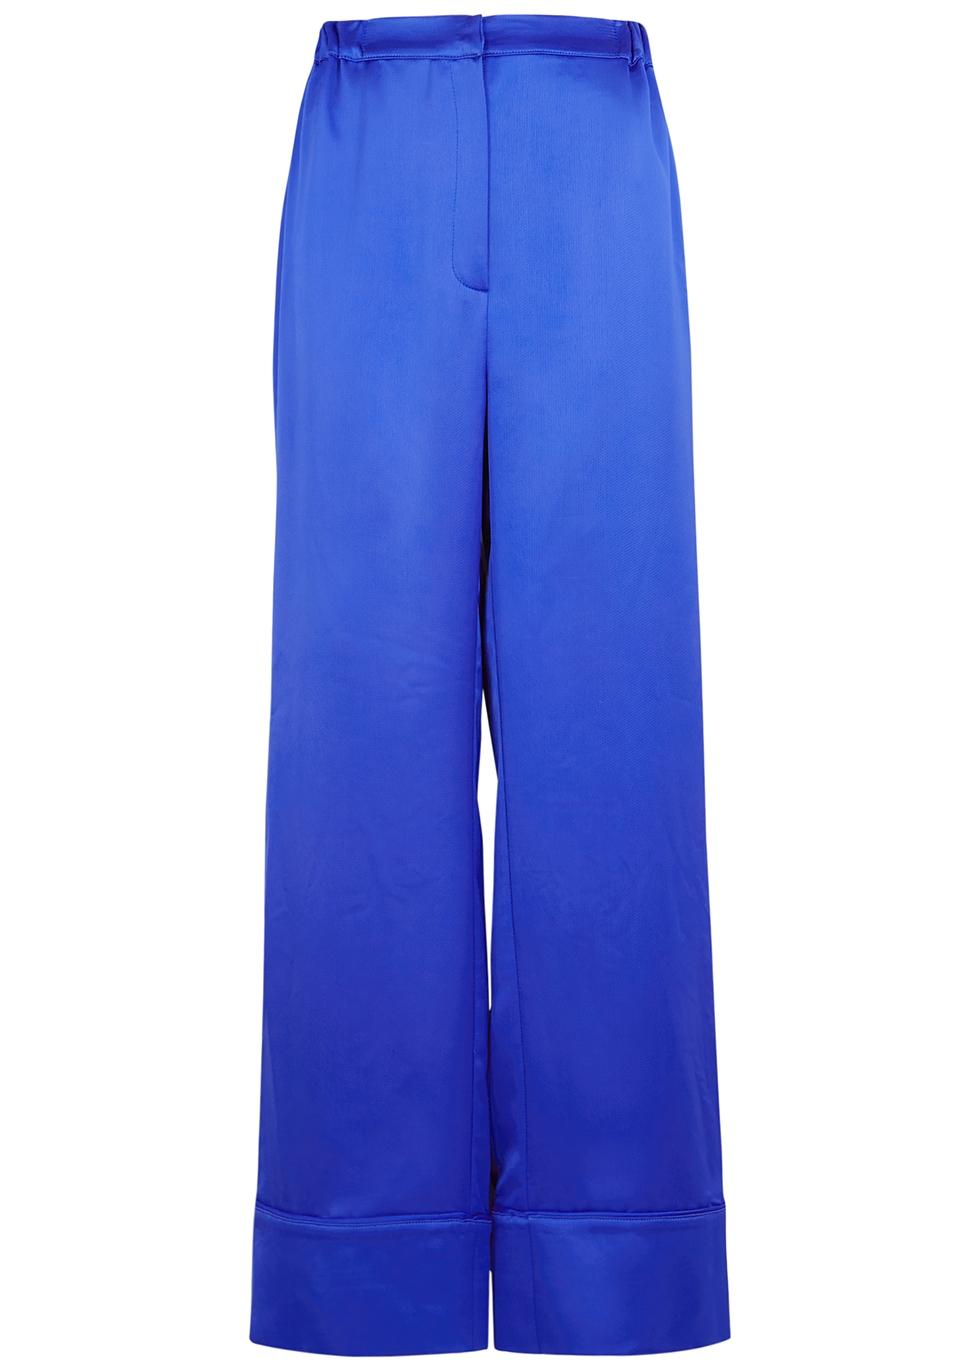 Benoit blue wide-leg satin trousers